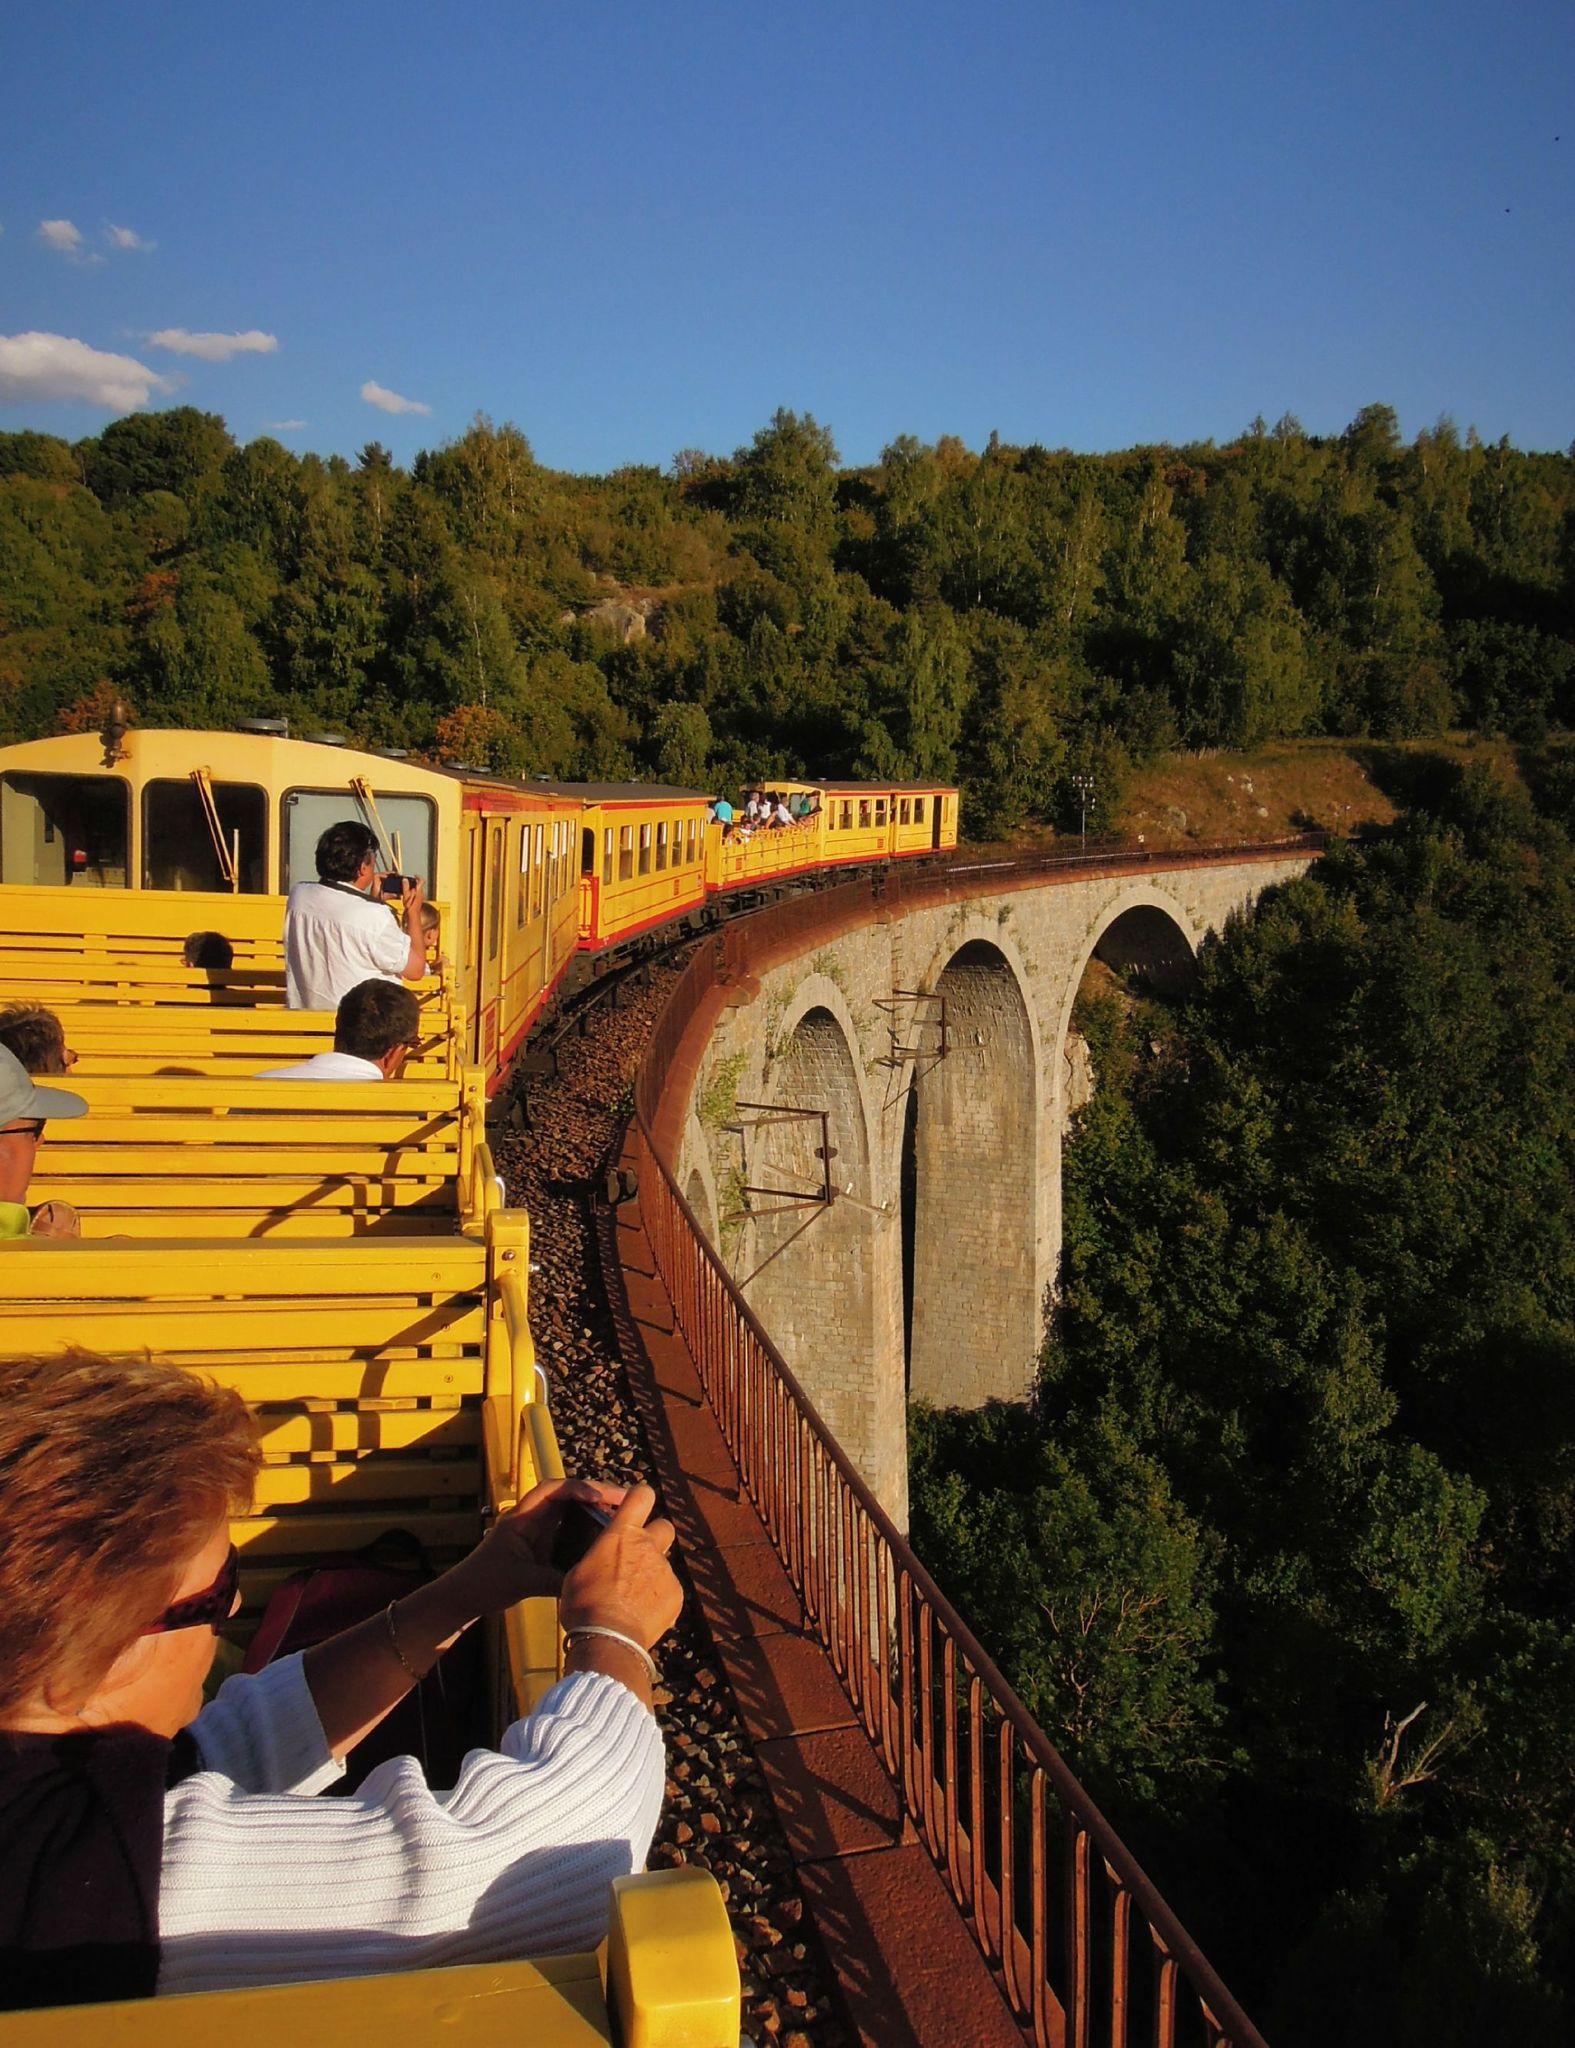 Ti train jaune 315